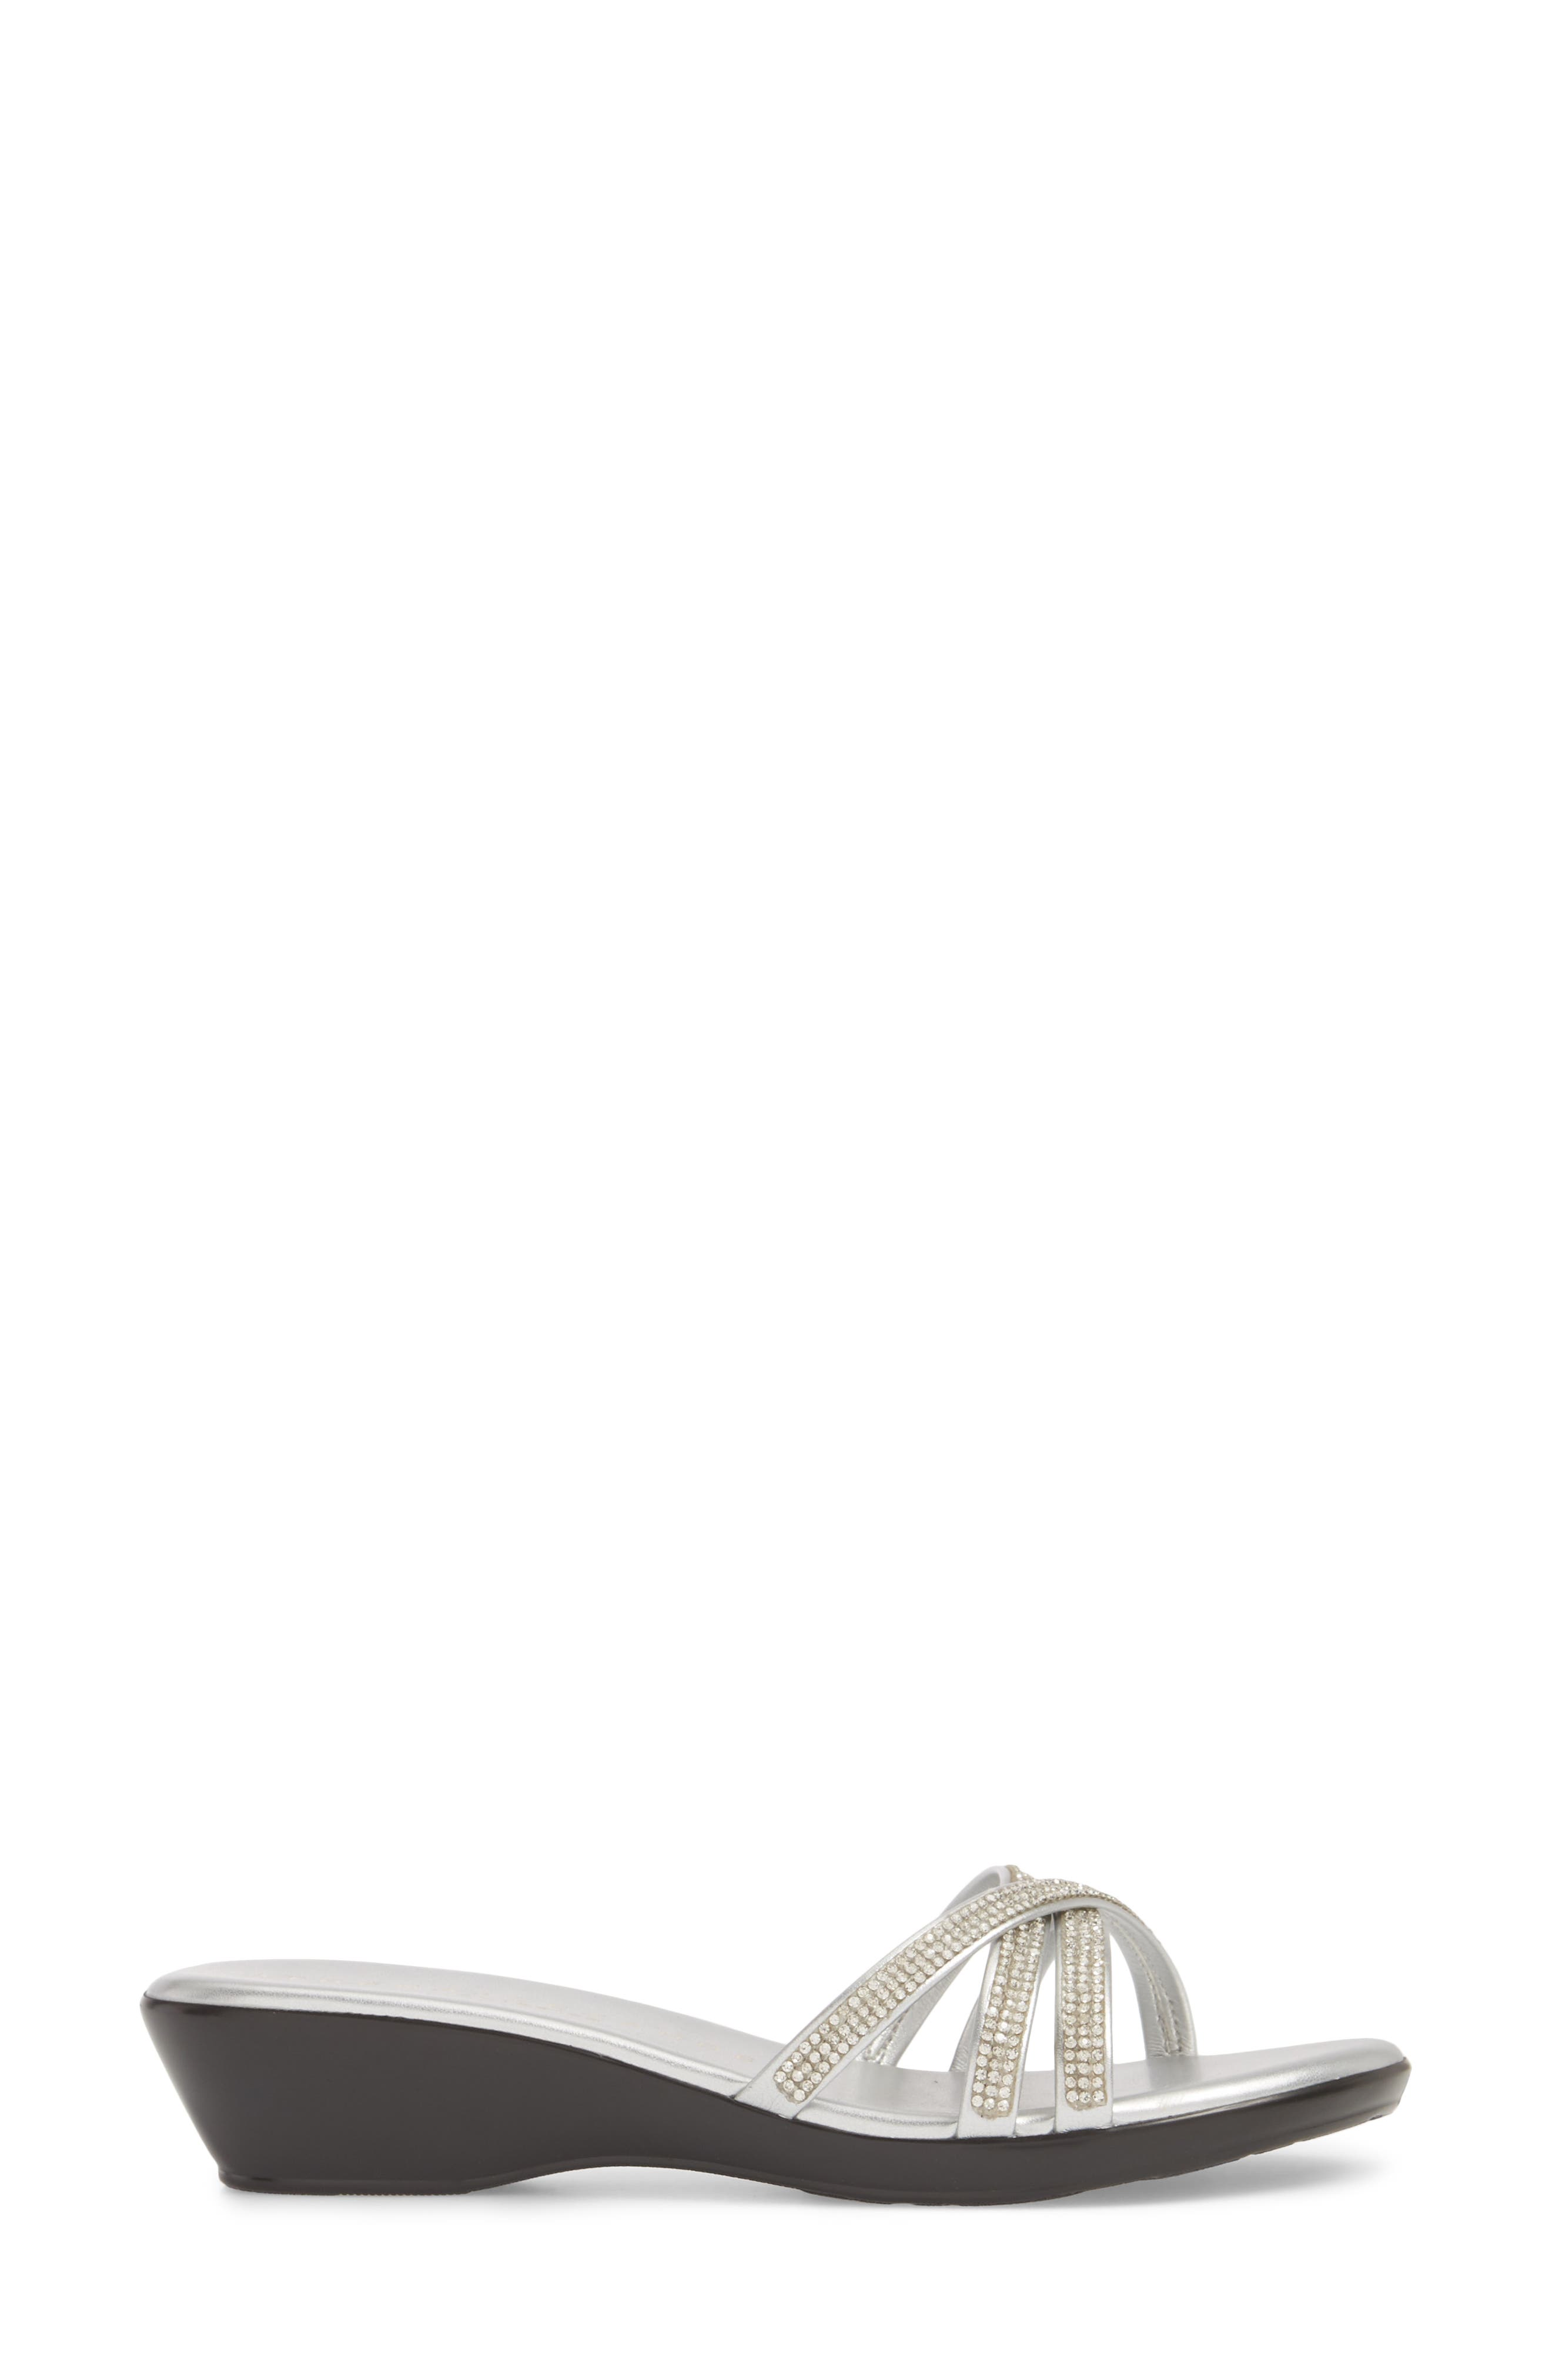 Harlow Slide Sandal,                             Alternate thumbnail 3, color,                             SILVER FABRIC